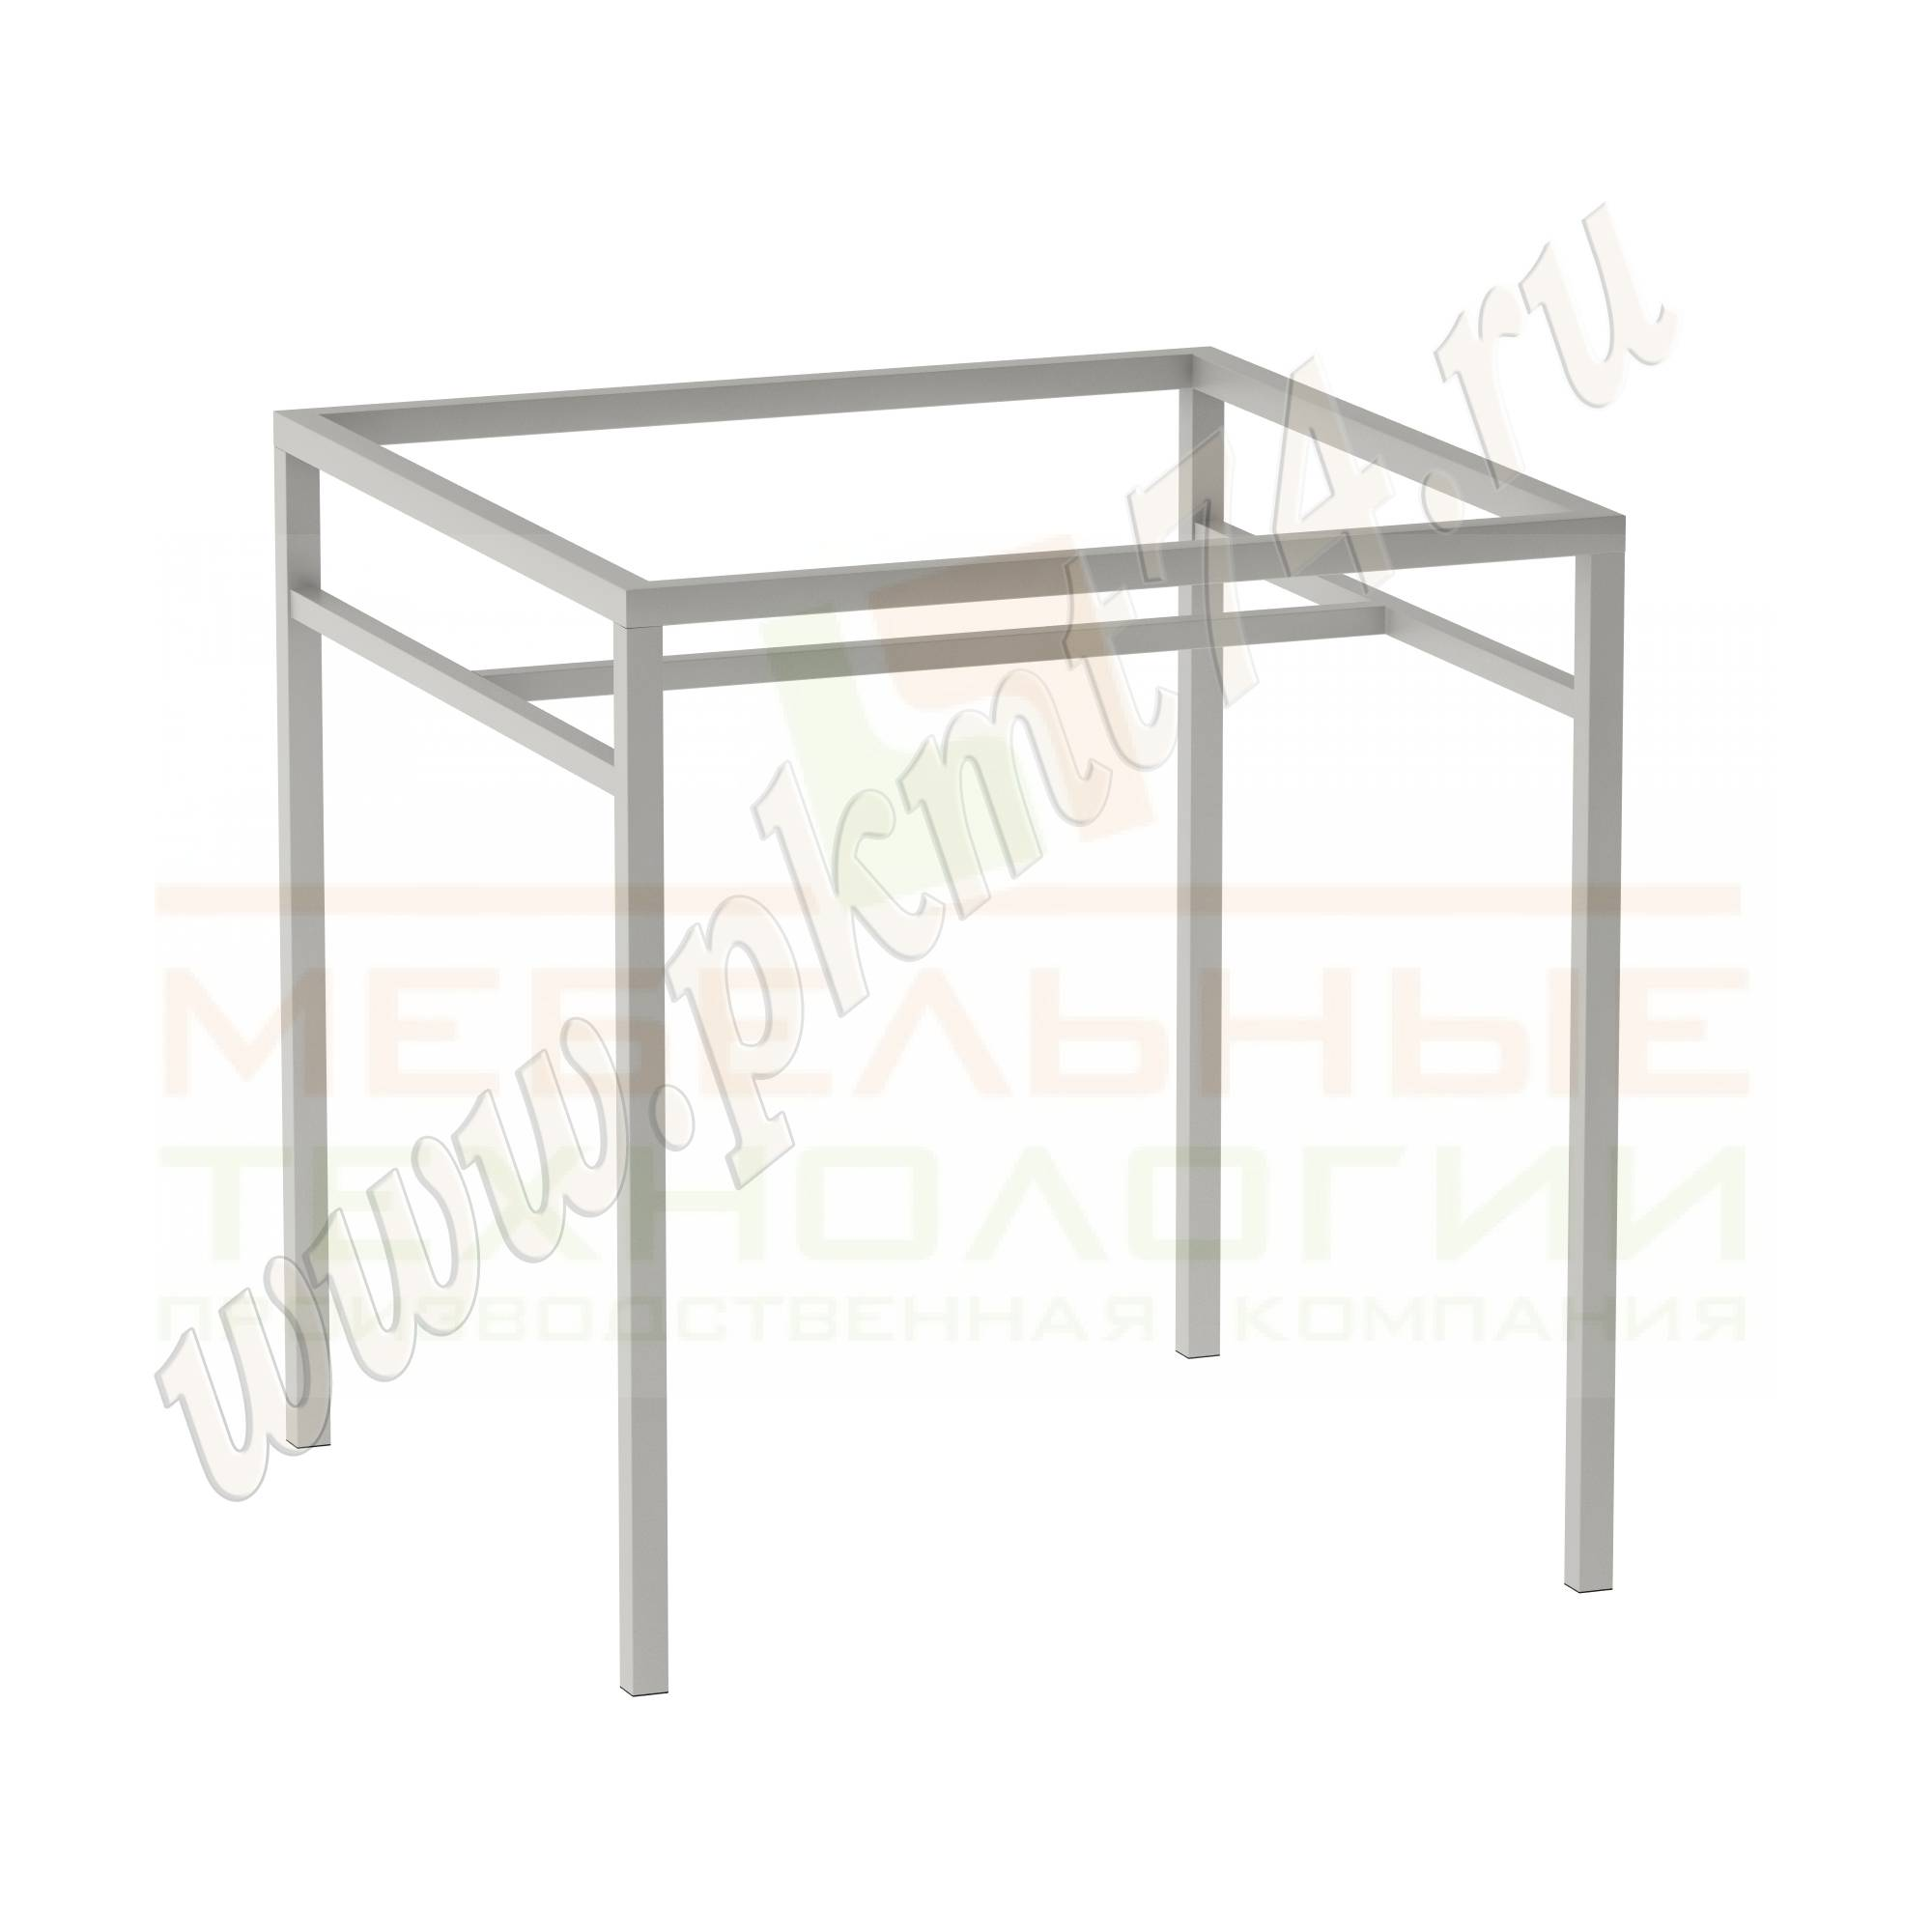 Каркас стола с обвязкой